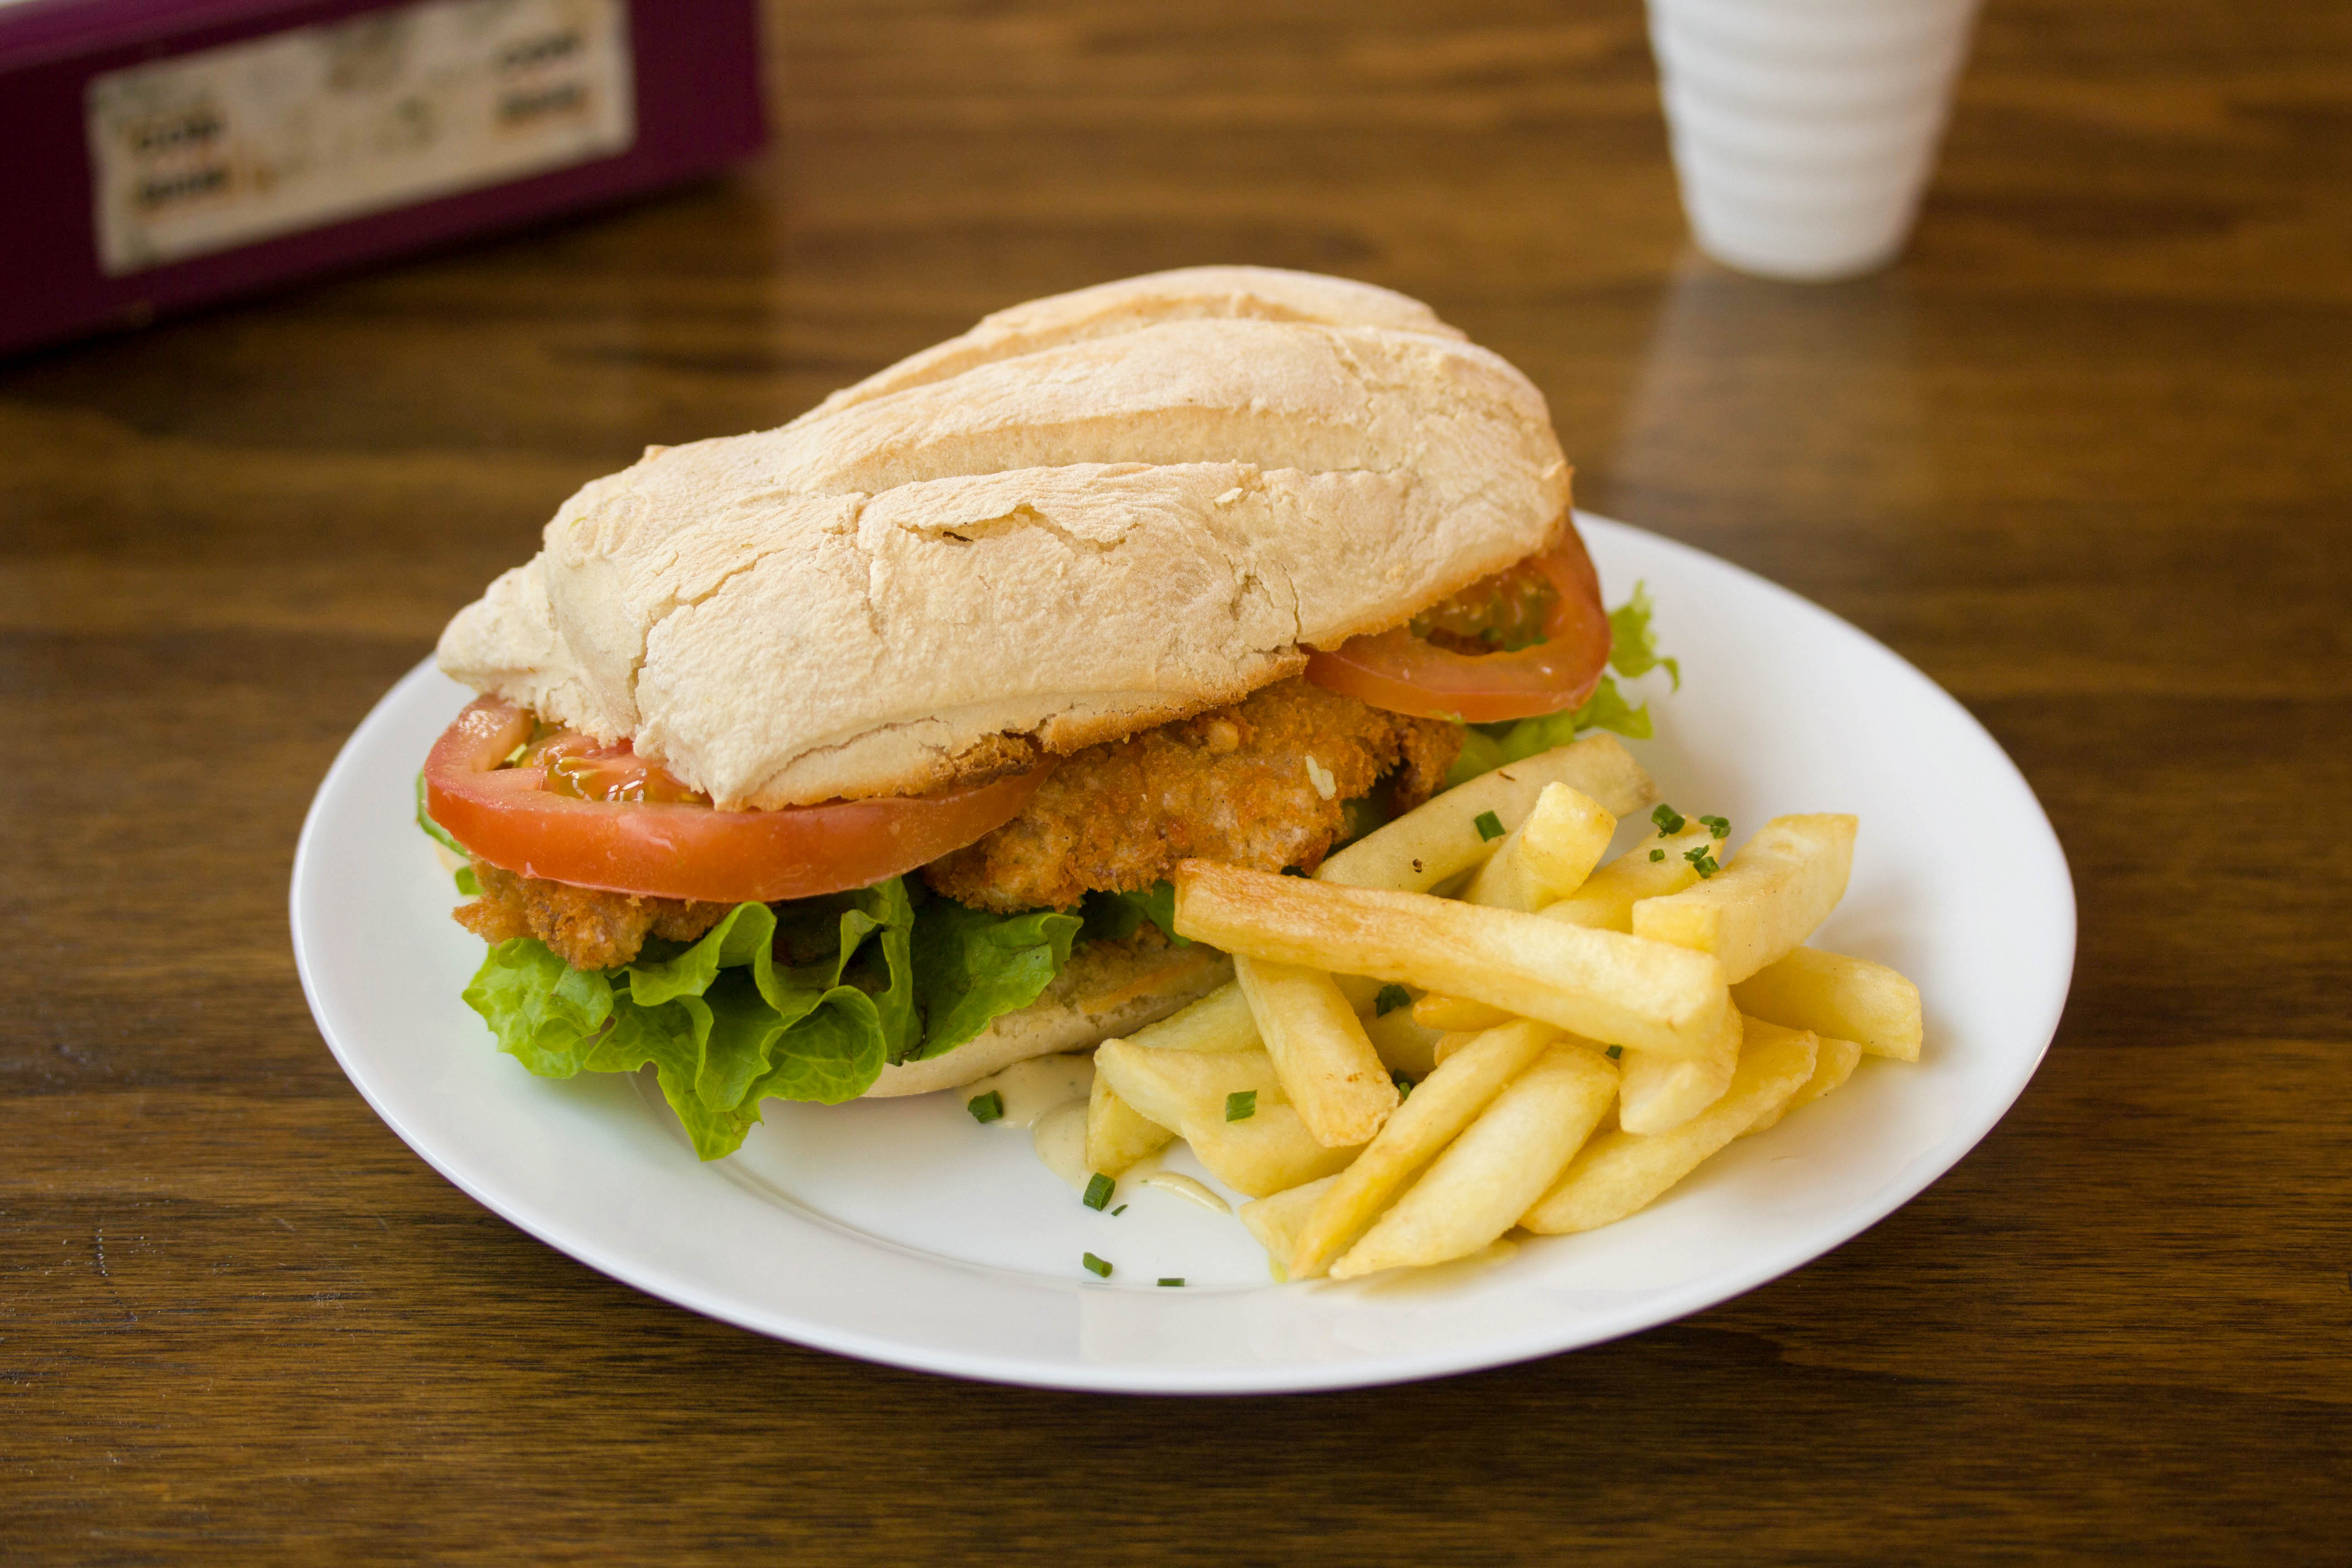 Sándwich de pollo crocante